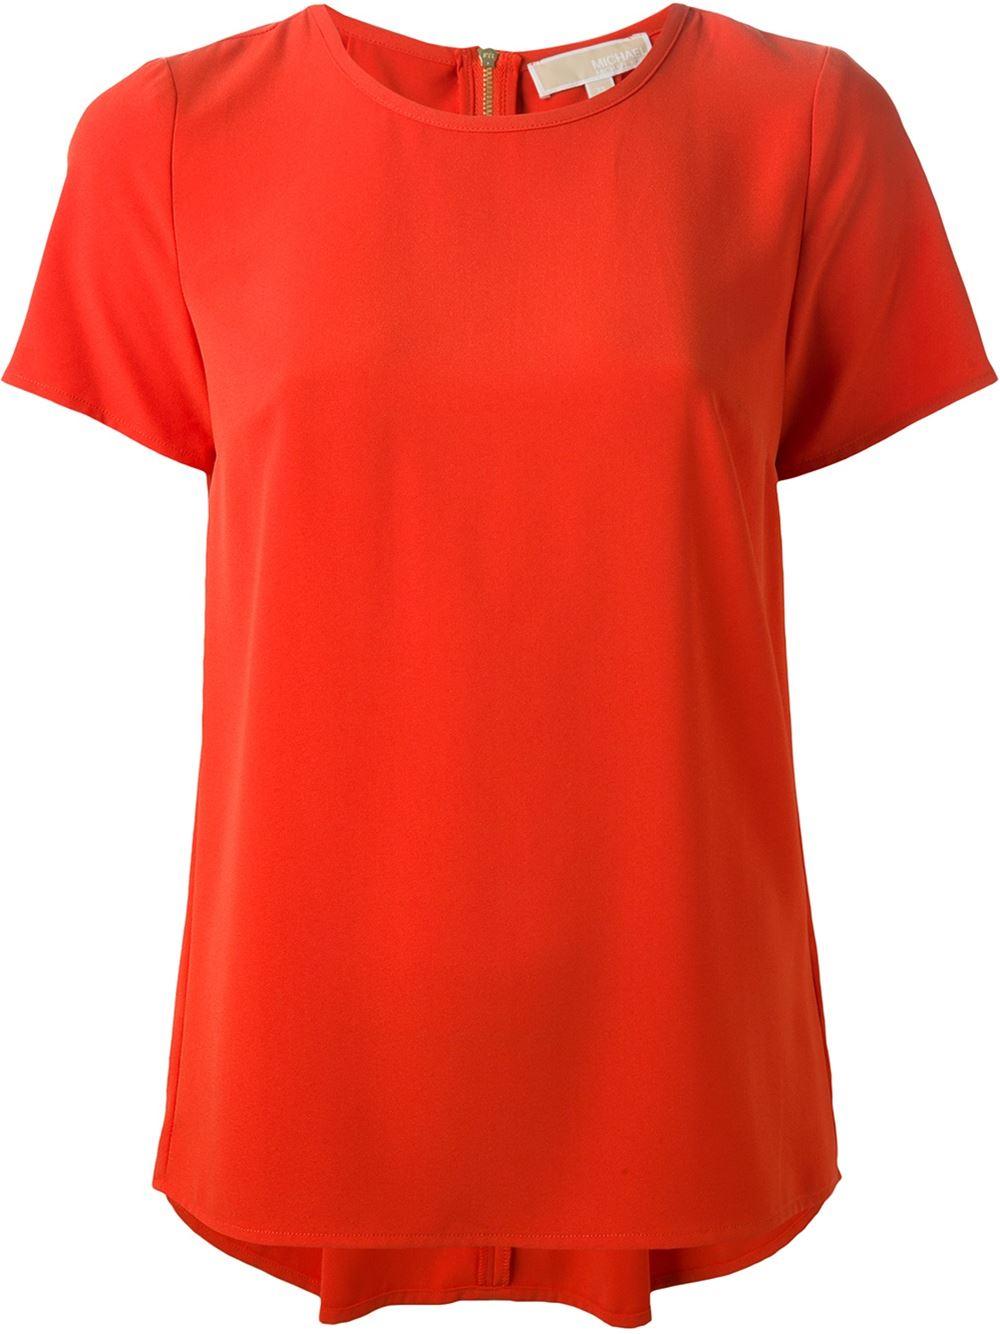 michael michael kors pleated back t shirt in orange yellow orange lyst. Black Bedroom Furniture Sets. Home Design Ideas